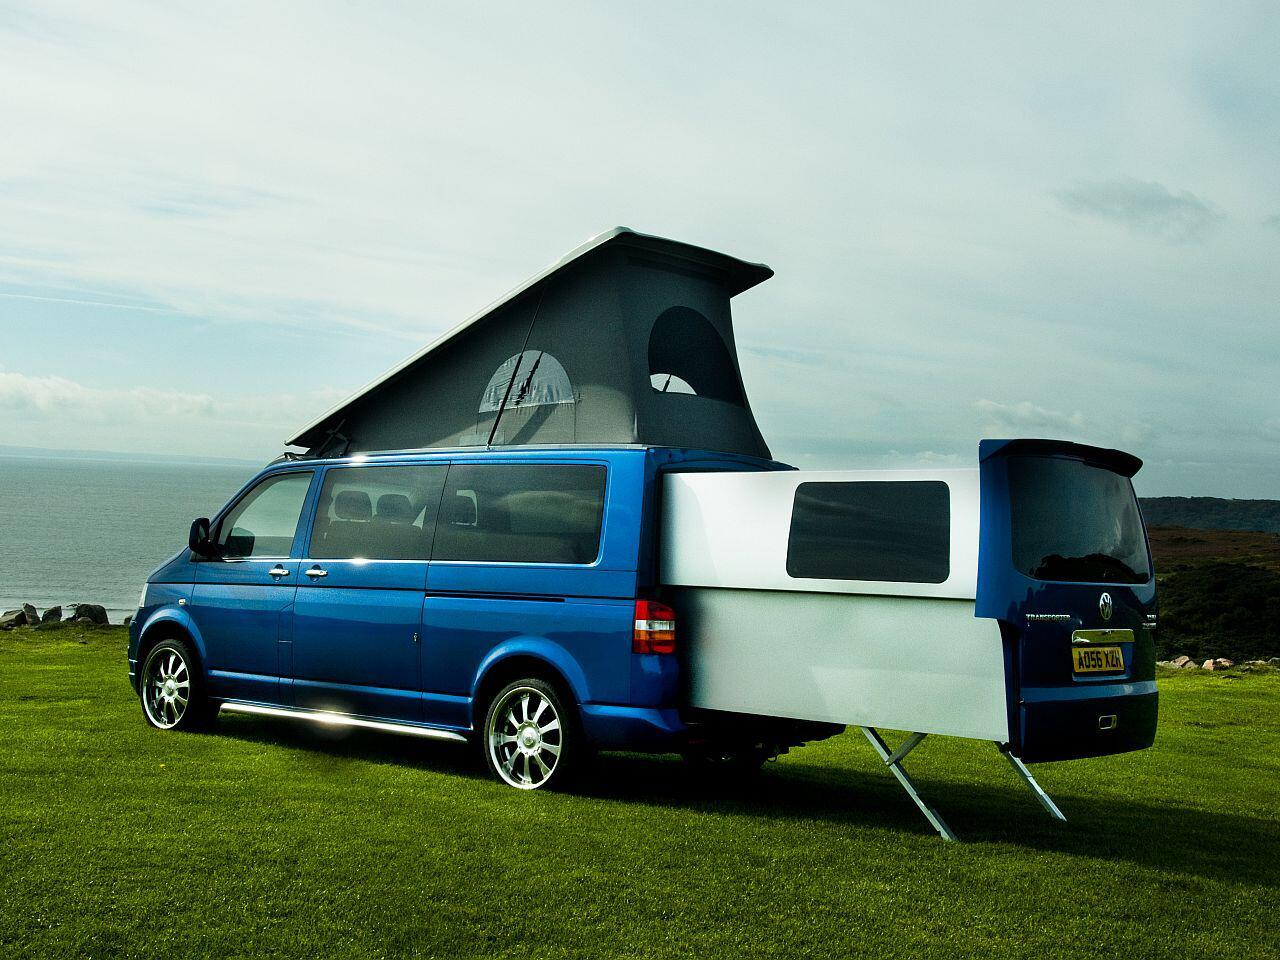 luxus schlafzimmer f r den campingausflug vw t5 bekommt ausfahrbare wohnzelle web de. Black Bedroom Furniture Sets. Home Design Ideas